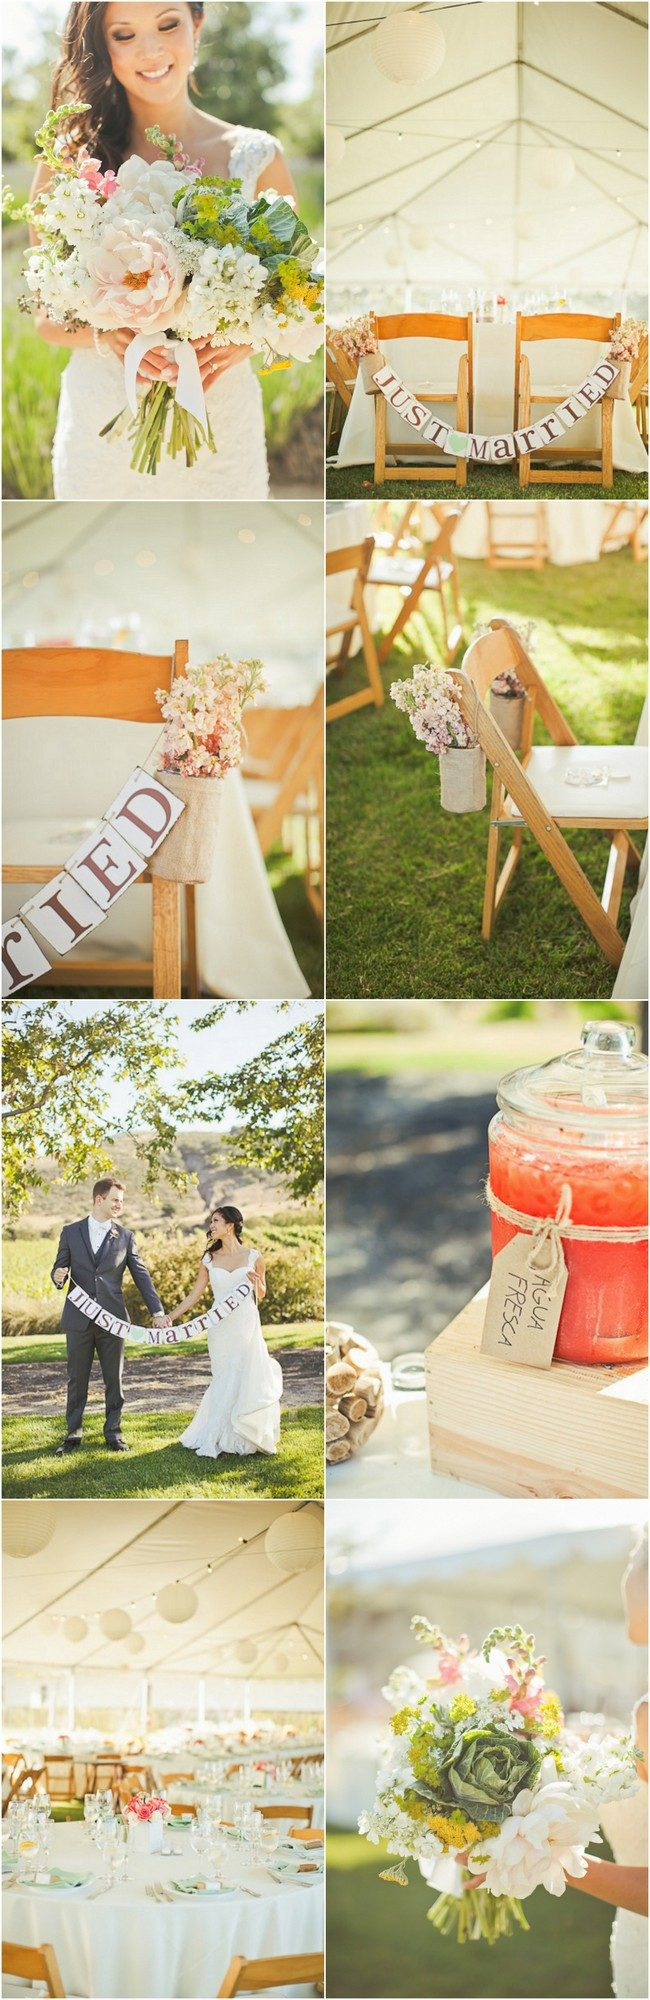 Rustic Southern California Vineyard Wedding